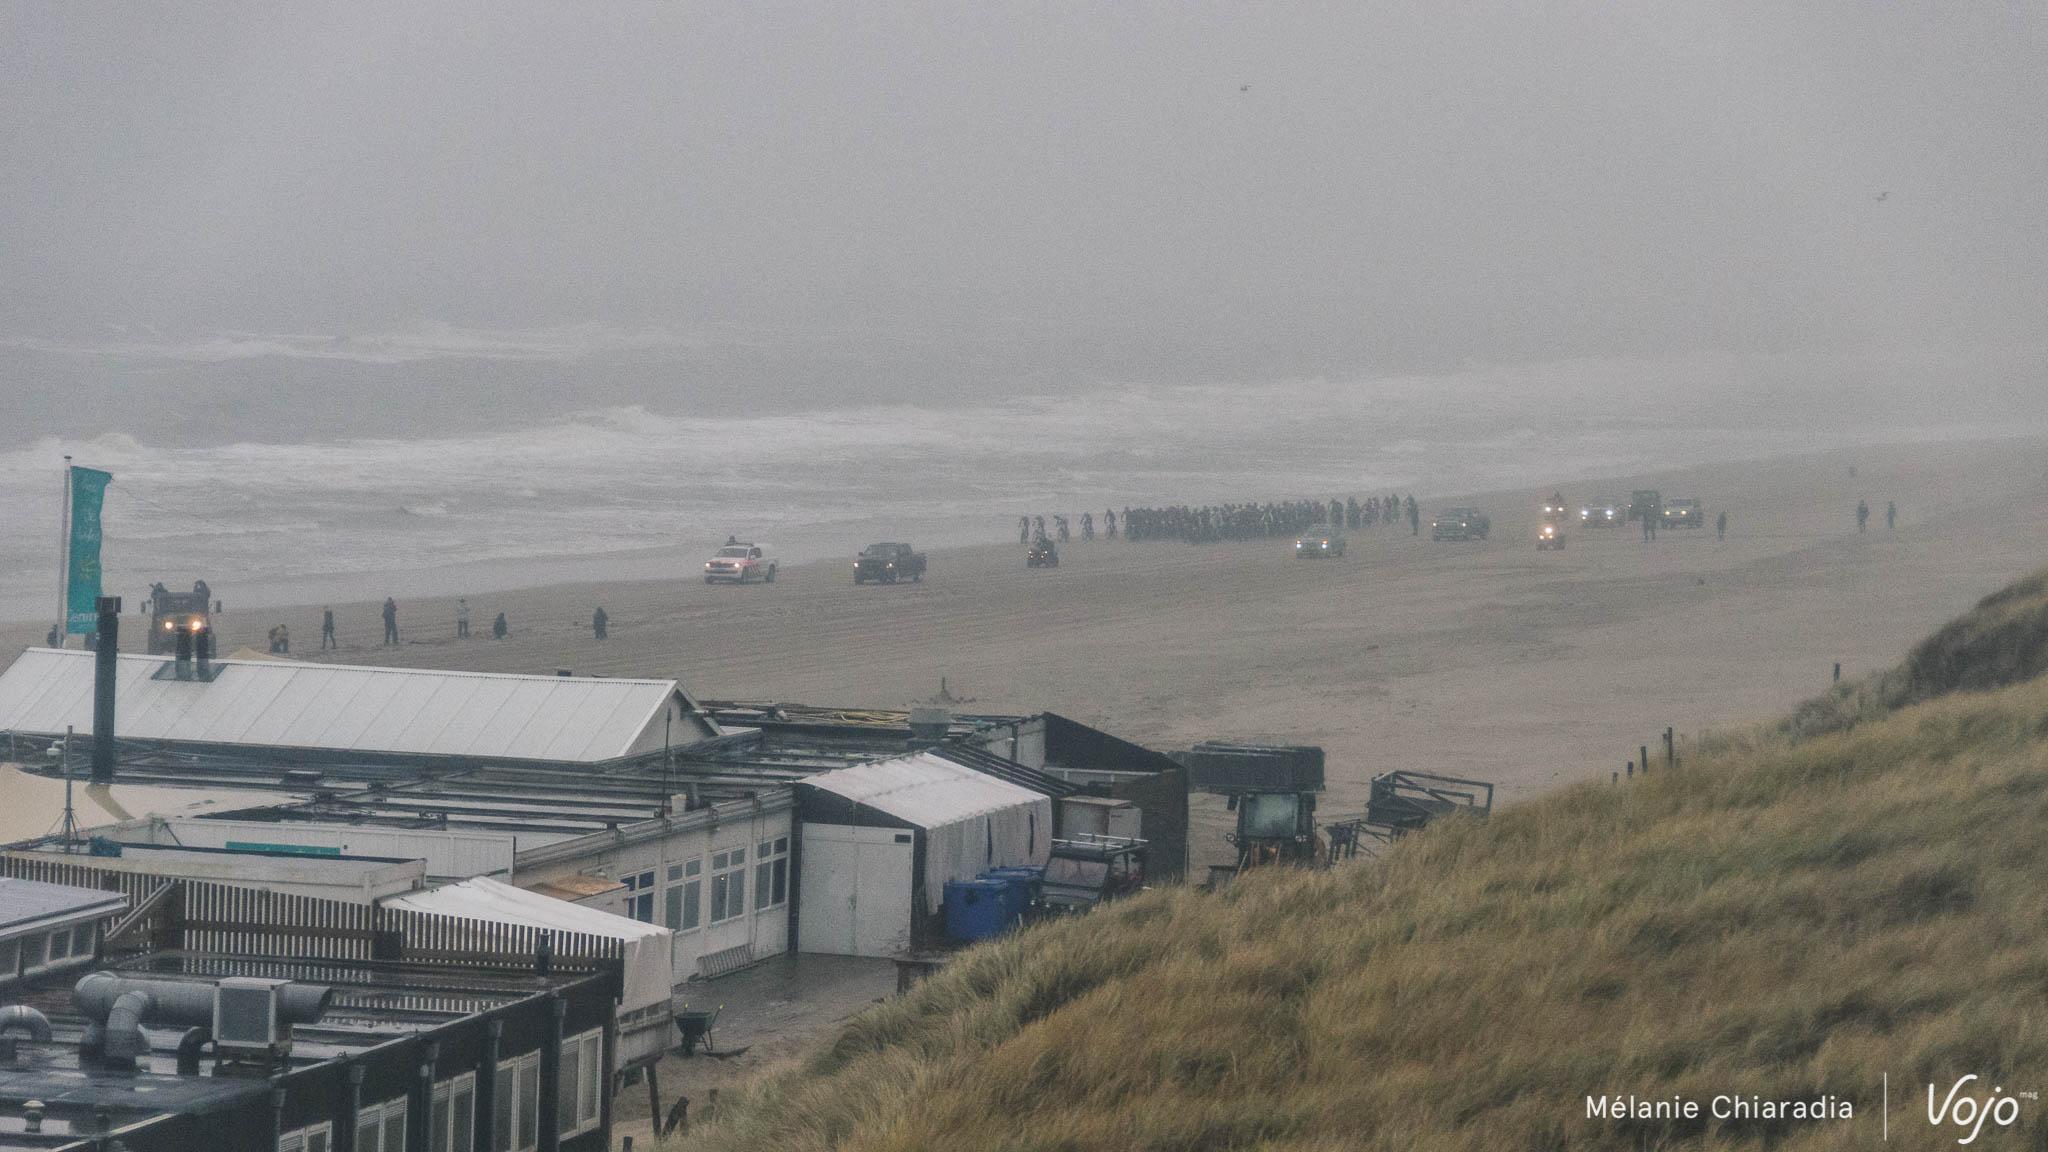 beachrace_egmond_pier_egmond_mel_copyright_obeart_vojomag-21